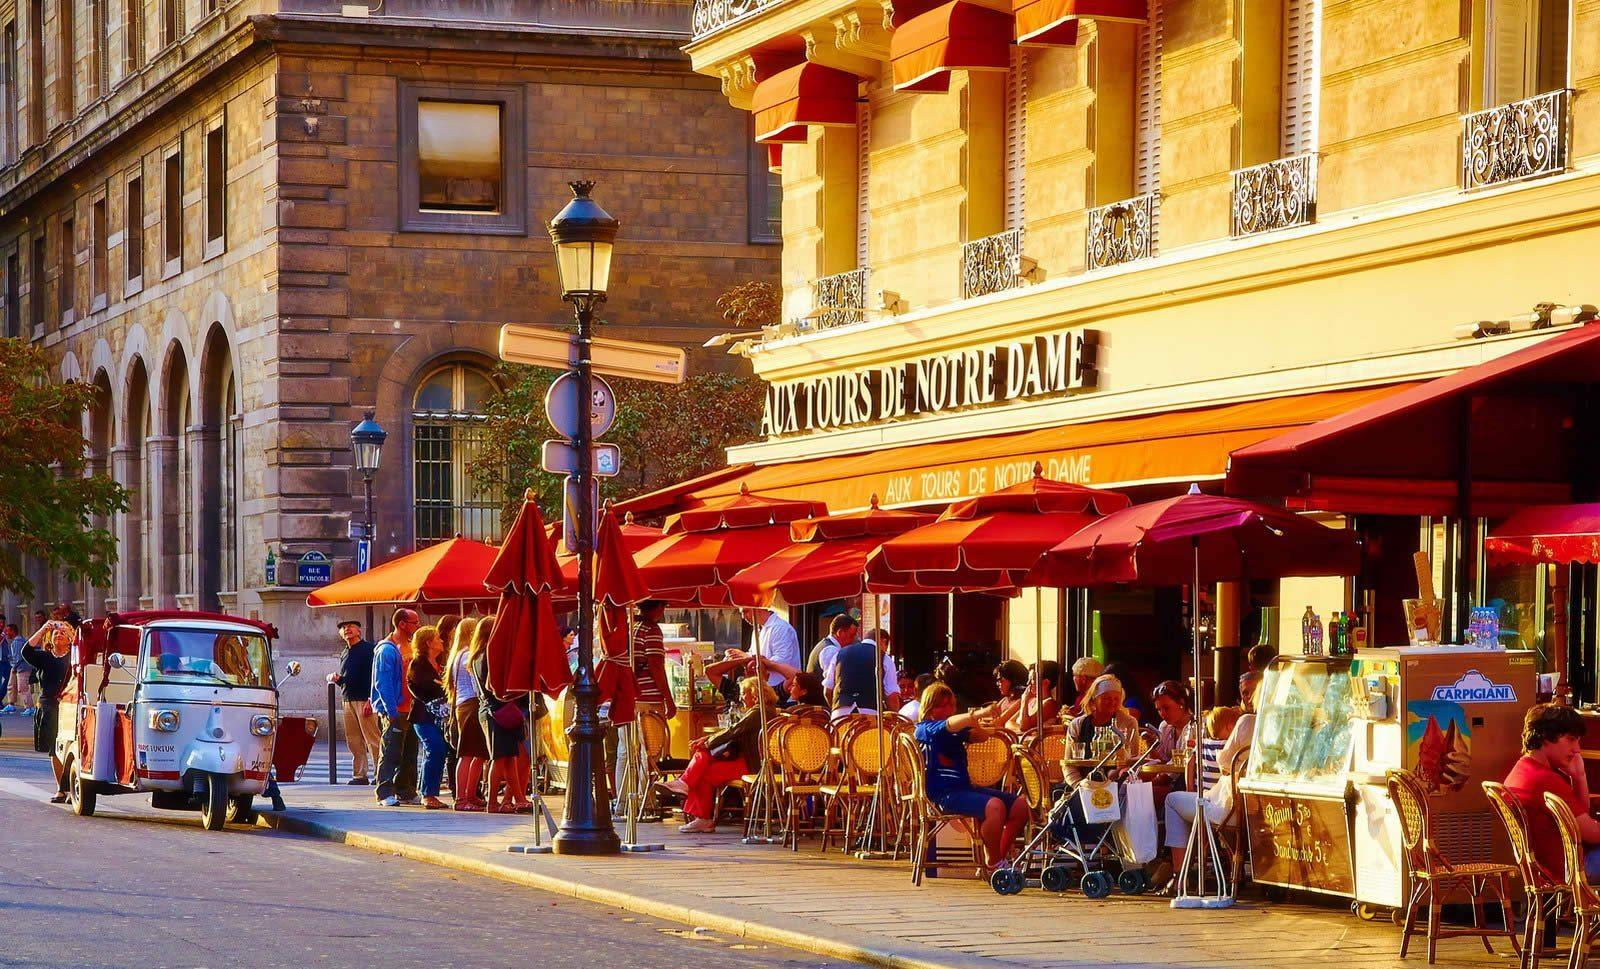 best-shopping-streets-rue-de-rivoli-marais-louvre-champs-elysees-saint-germain-des-pres-opera